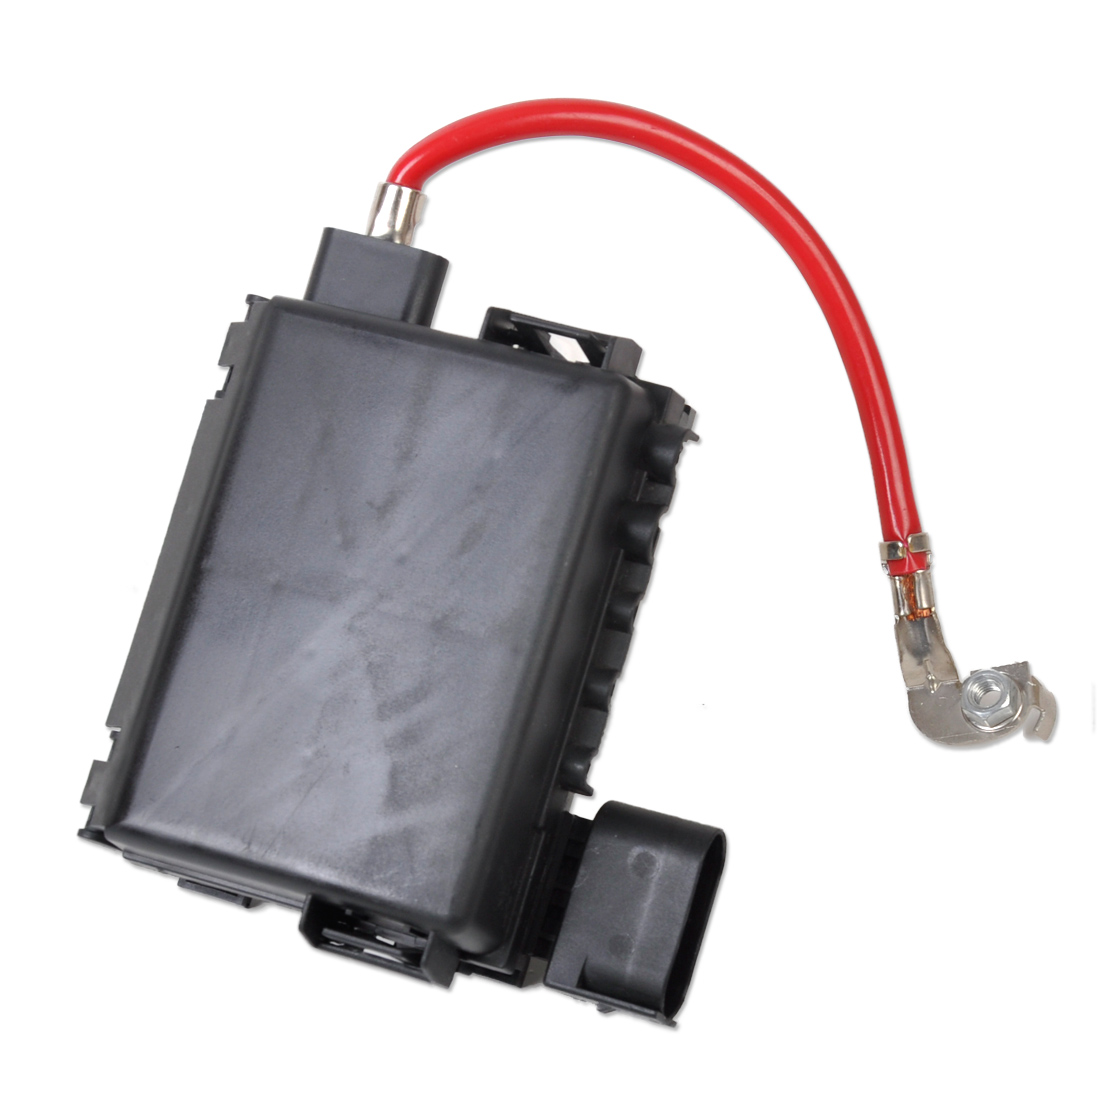 dwcx 1j0937550a black fuse box battery terminal for volkswagen vw beetle golf jetta [ 1110 x 1110 Pixel ]